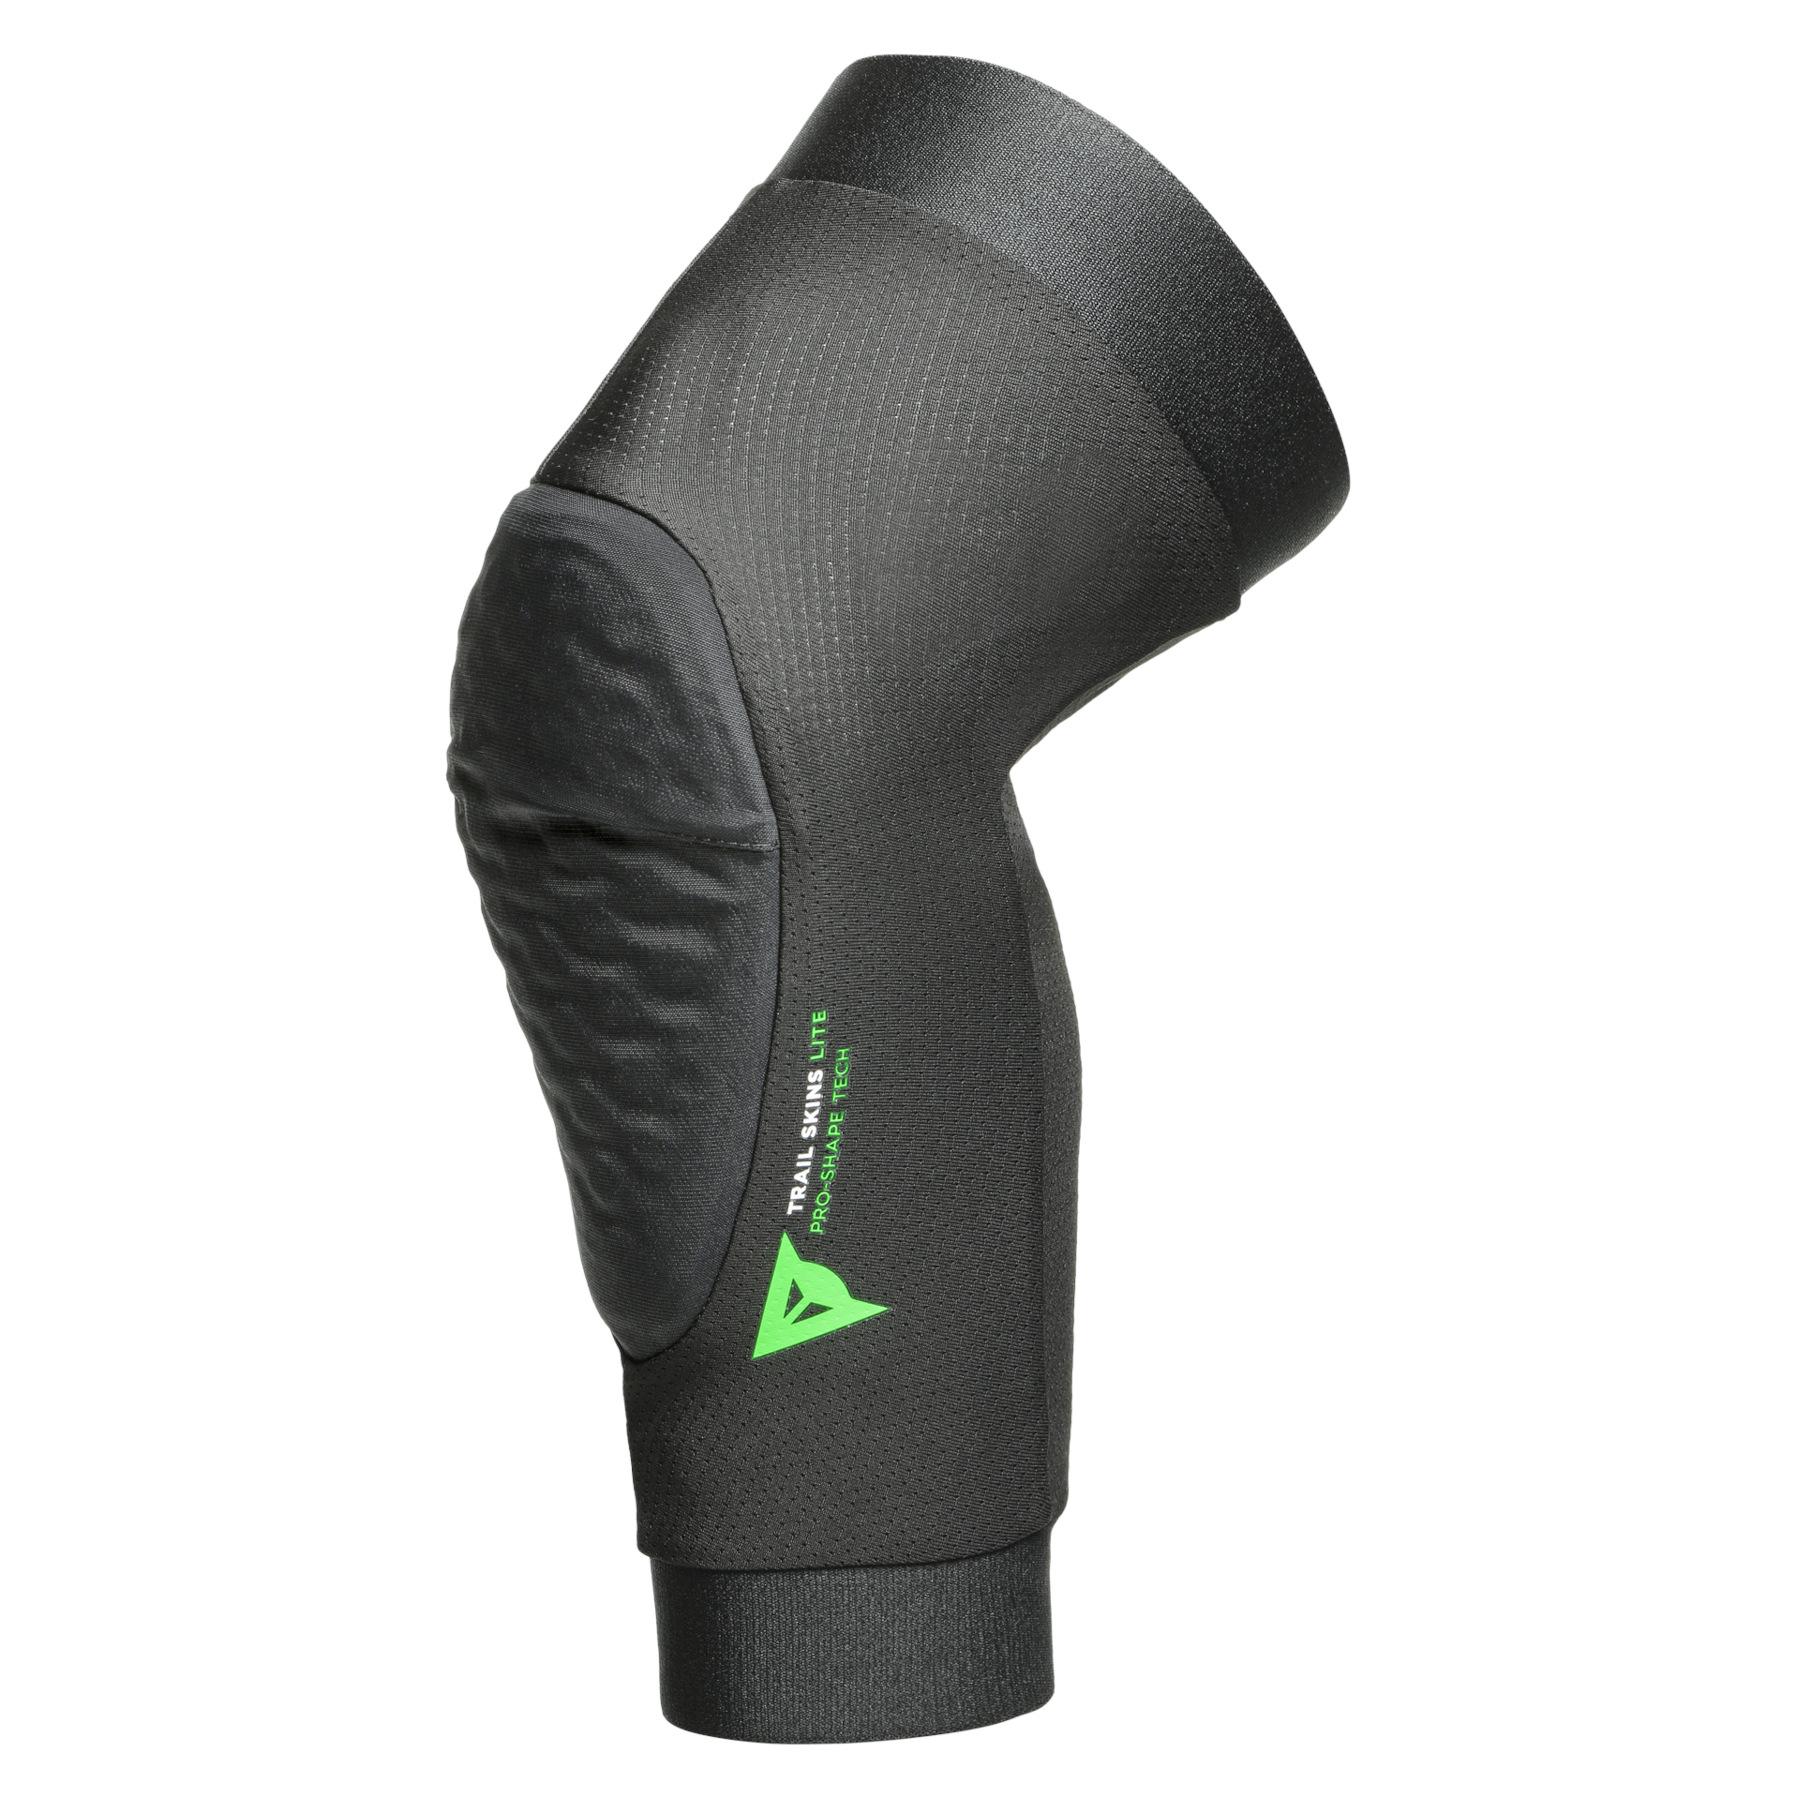 Dainese Trail Skins Lite Knee Guards - black